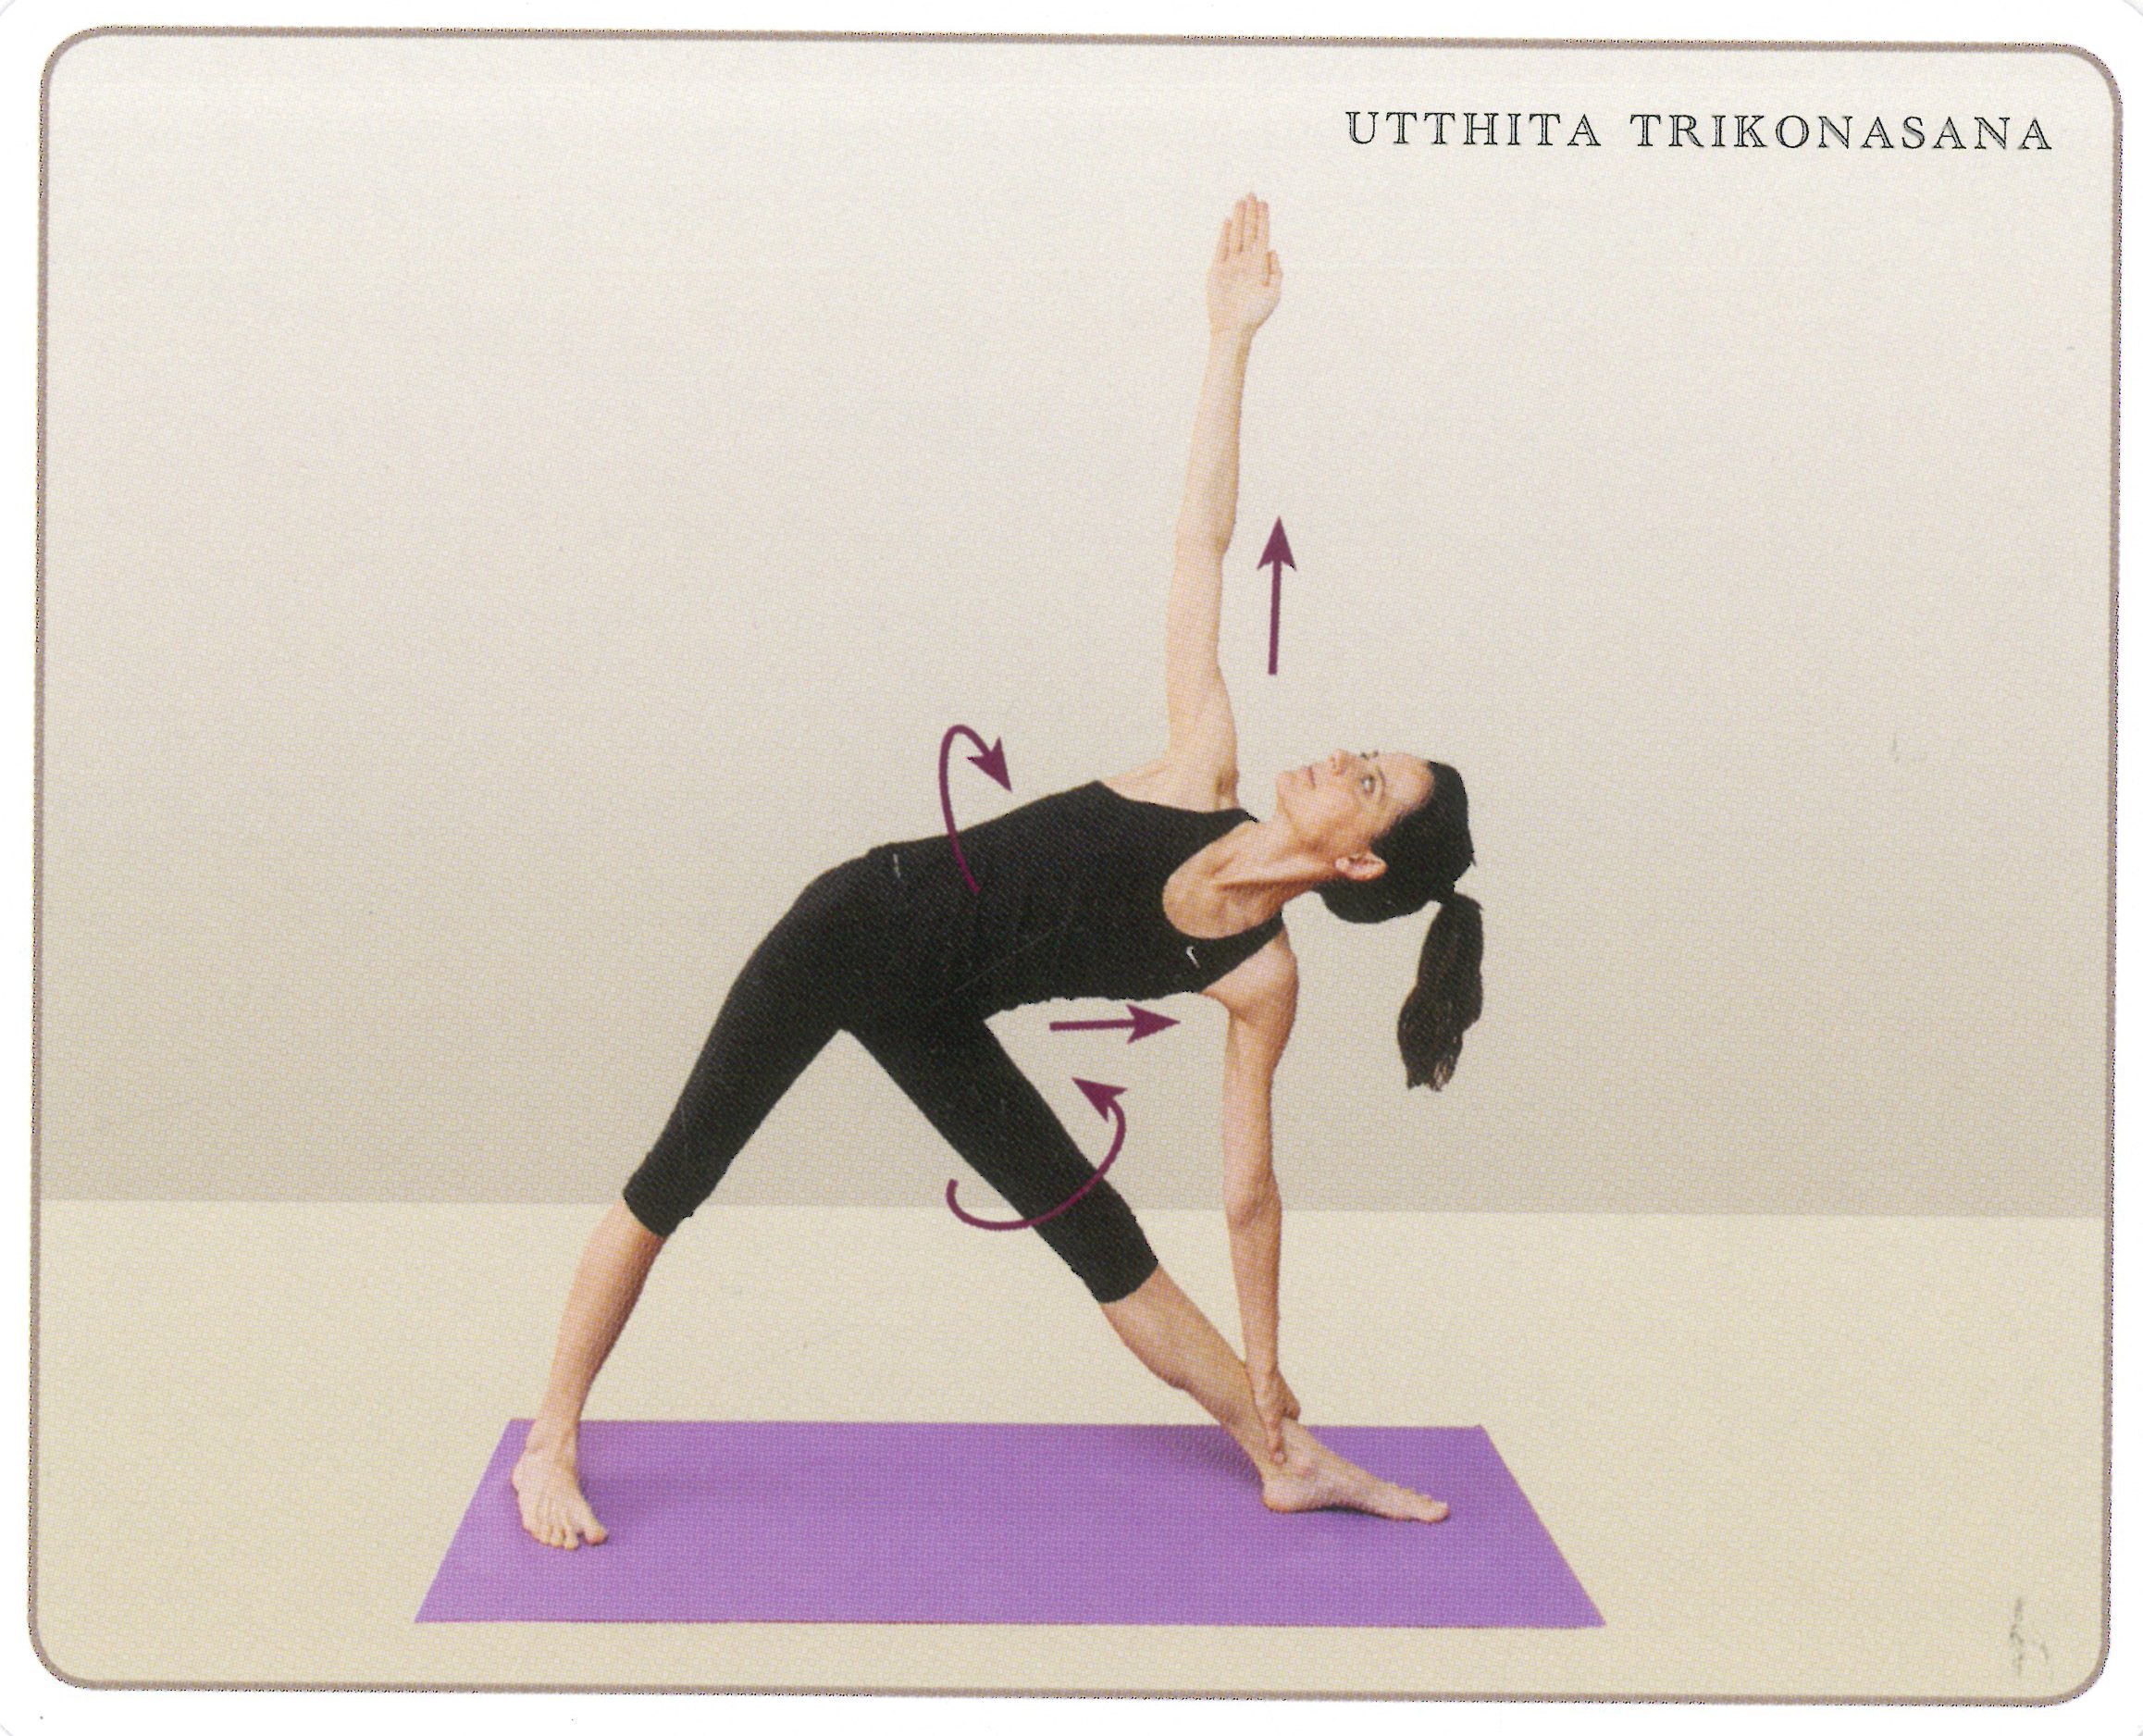 Amazon.com: New Yoga Flash Cards - Asana Instruction ...